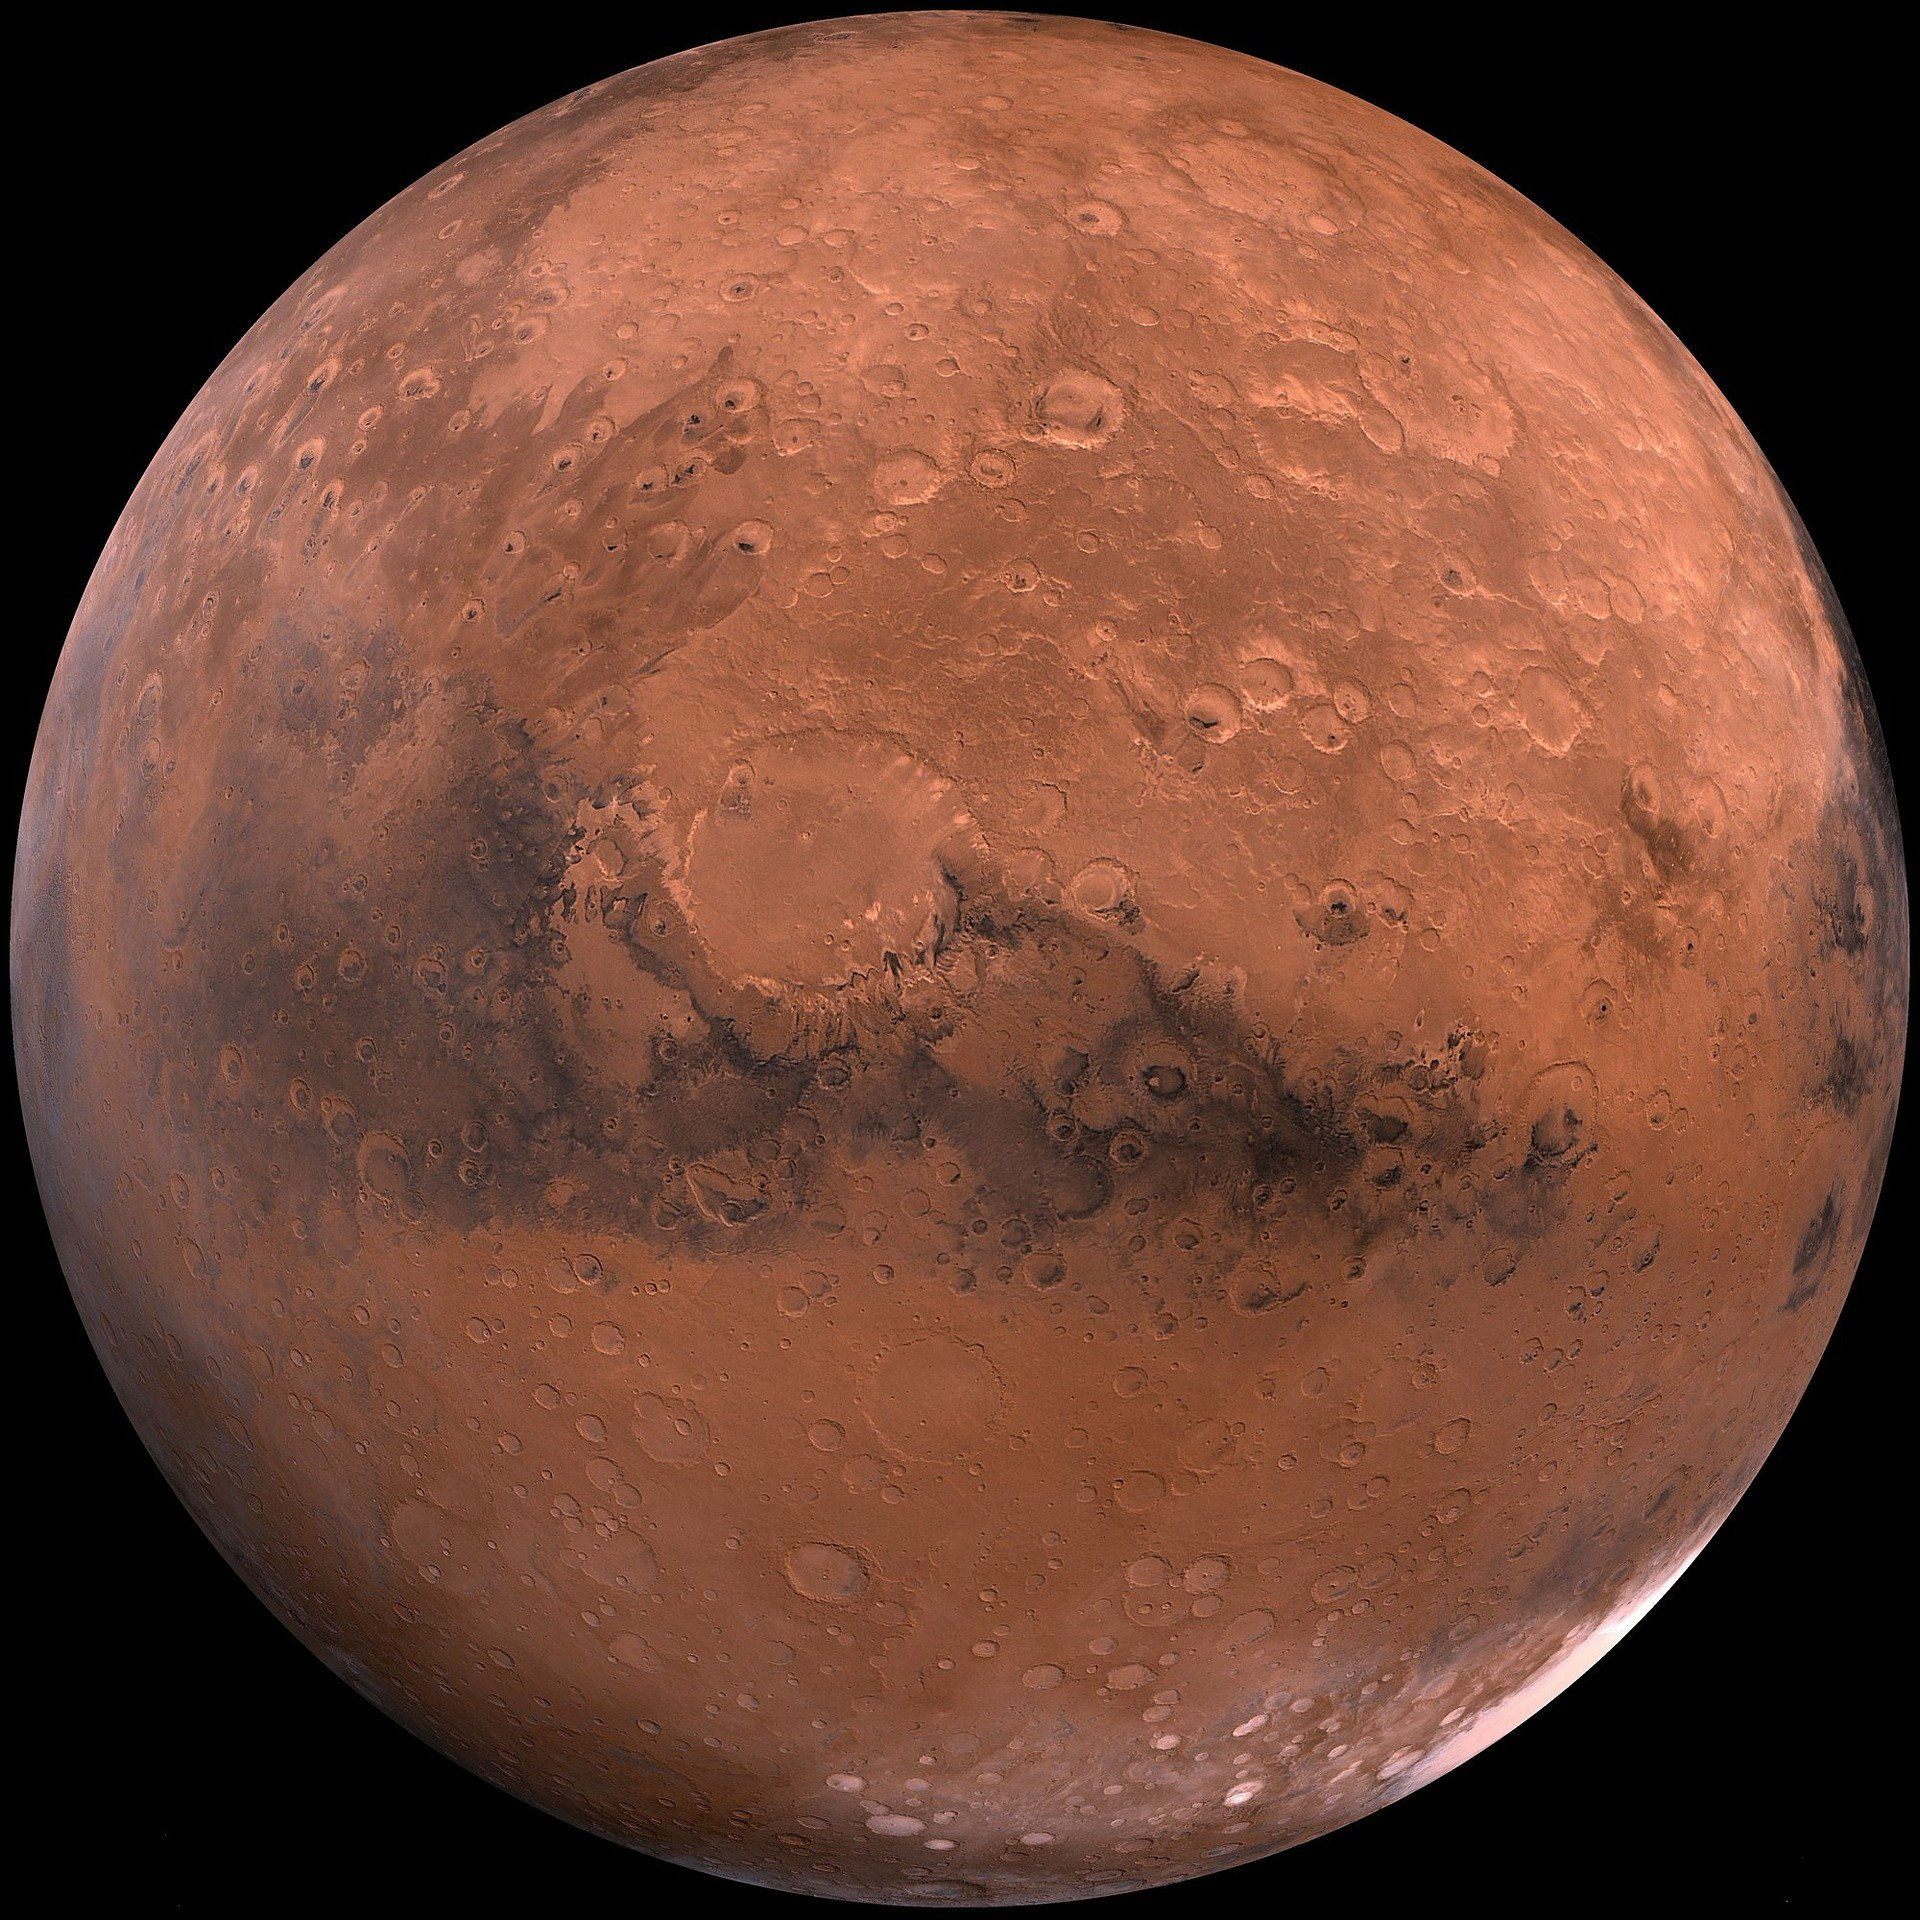 Mars - Planet Mars